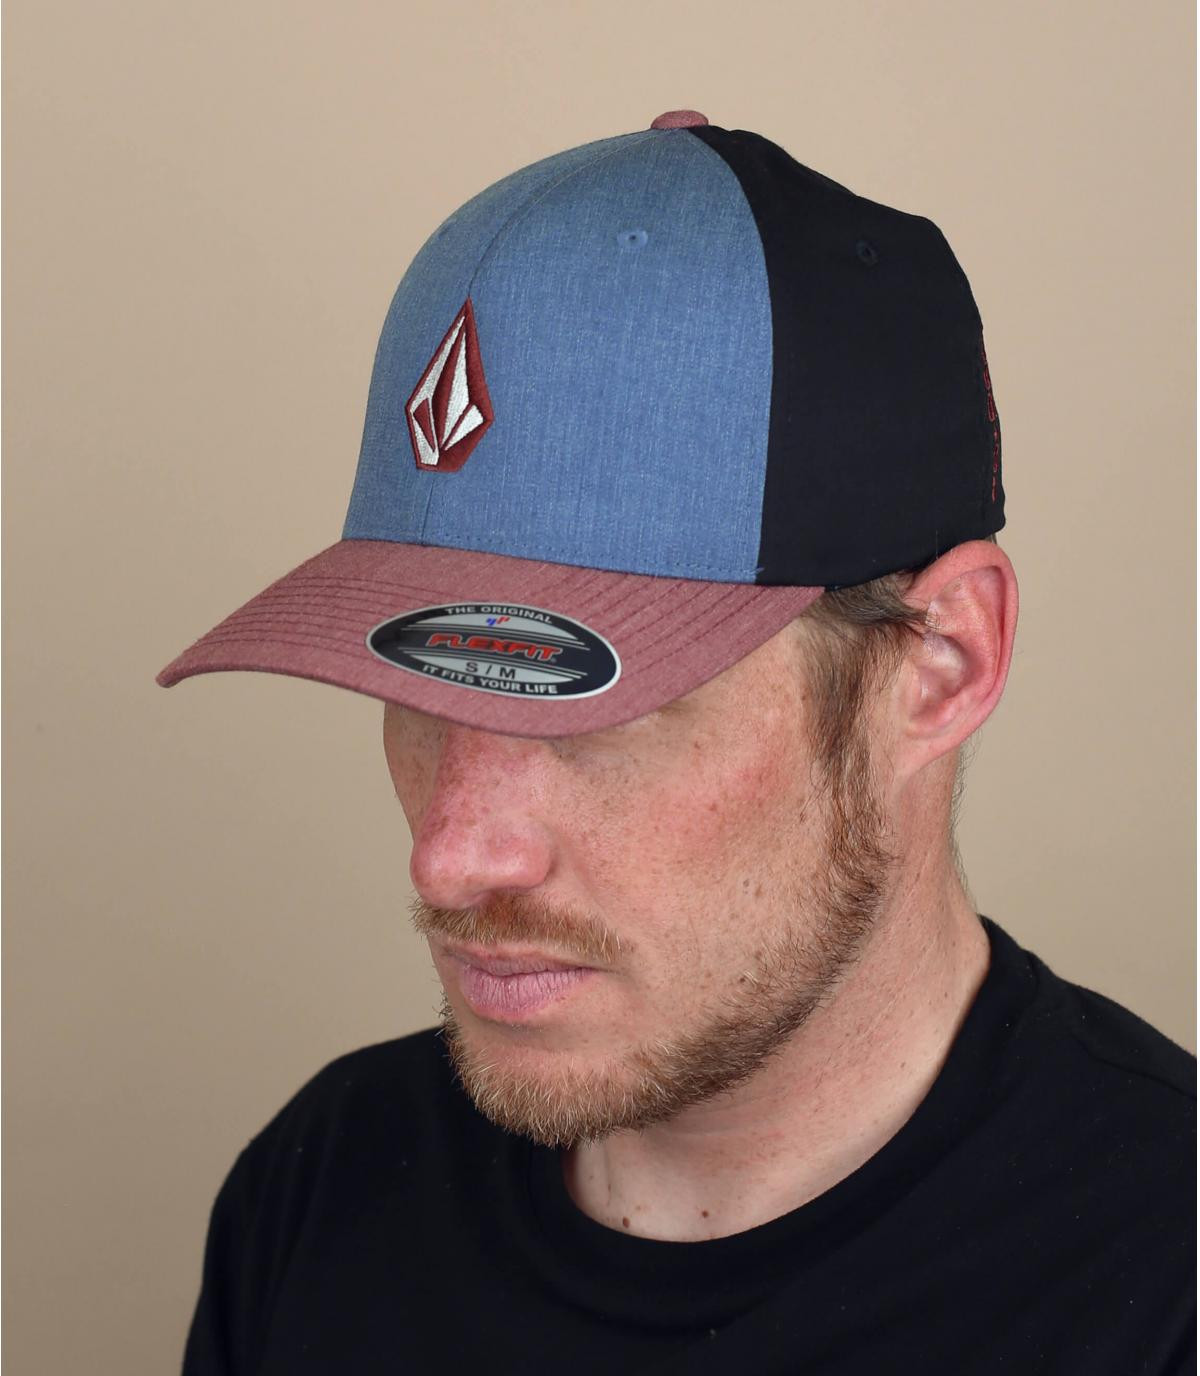 cappellino Volcom blu rosso